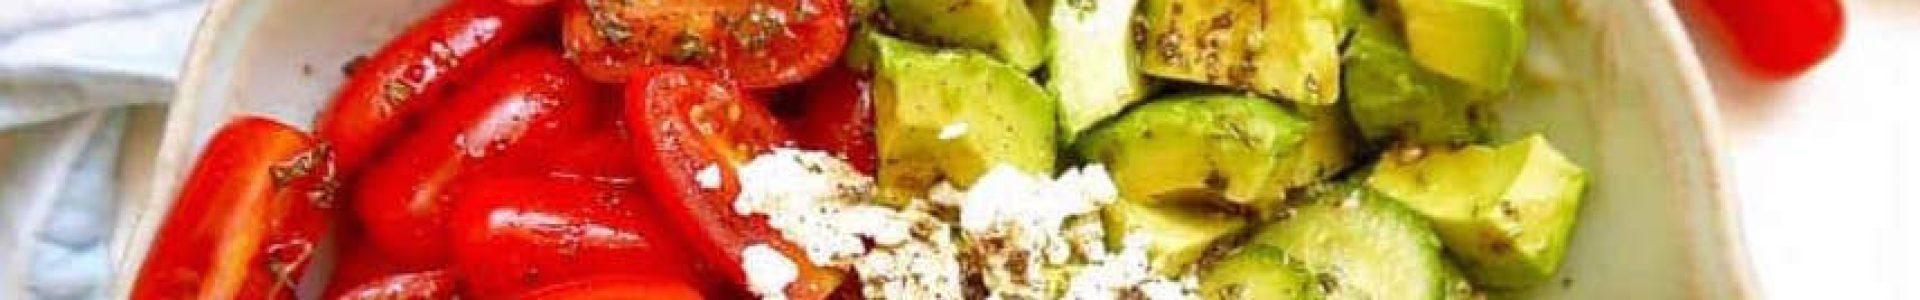 Balsami-Tomato-Cucumber-Avocado-Salad-perchancetocook-4-768x912